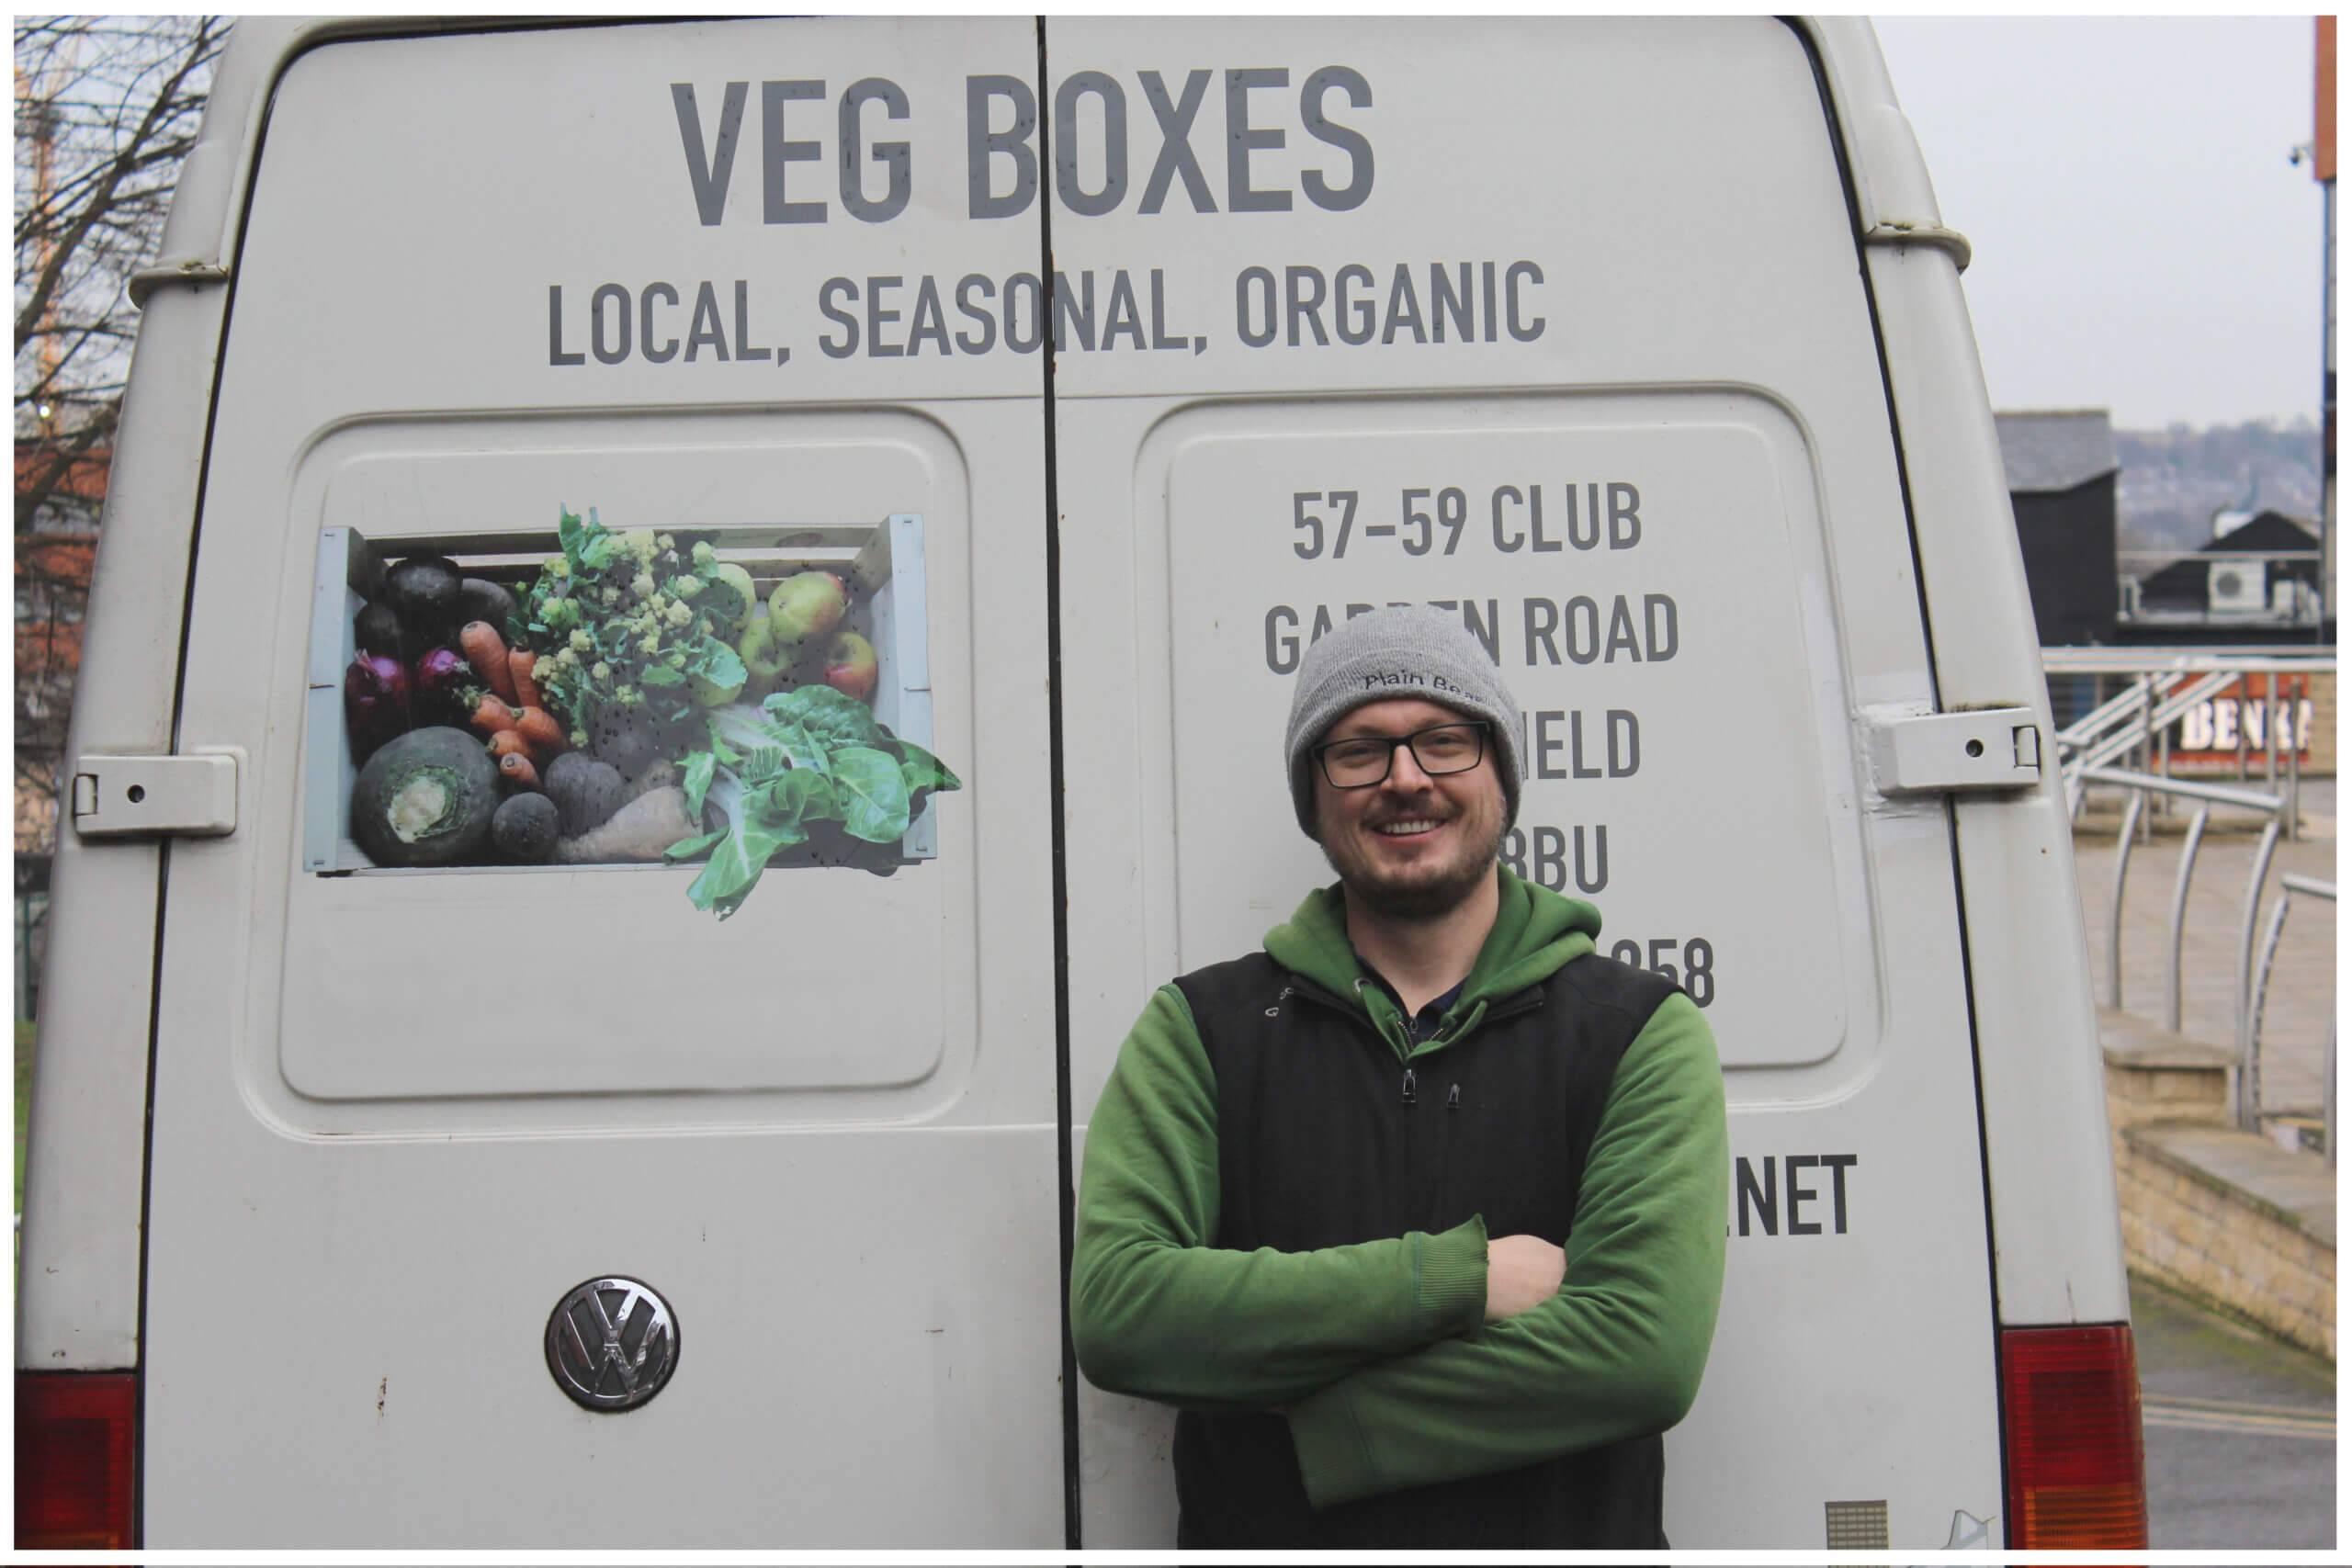 Regather Food Delivery Sheffield, Doug Kemp